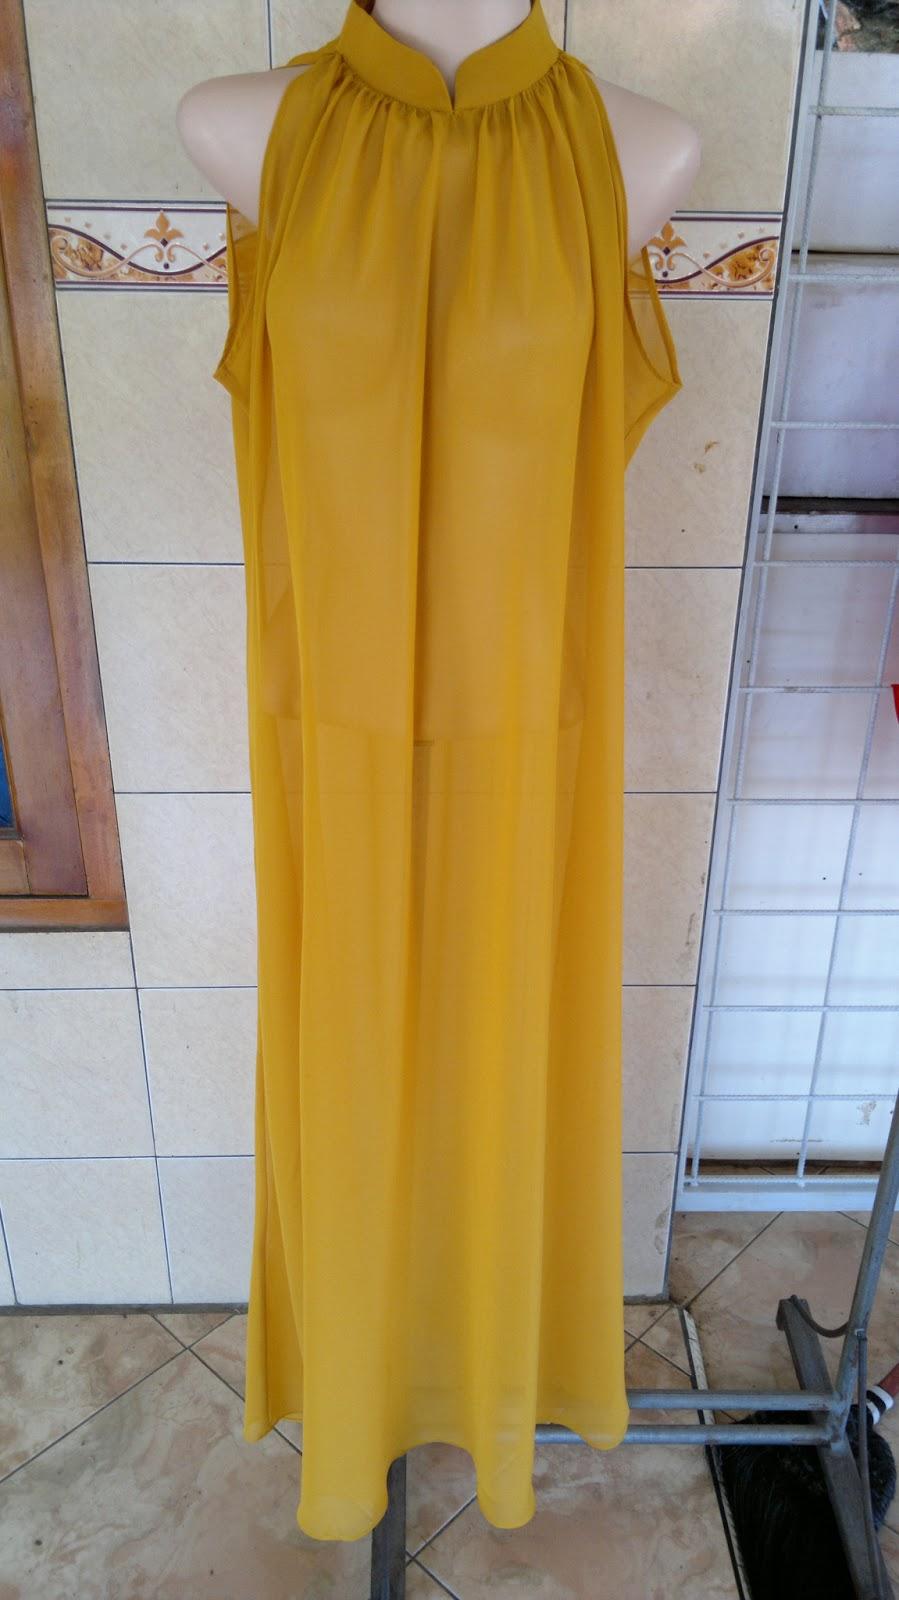 Pencinta Fashion Tas Bermerek TAMPIL CANTIK LEBARAN 2013